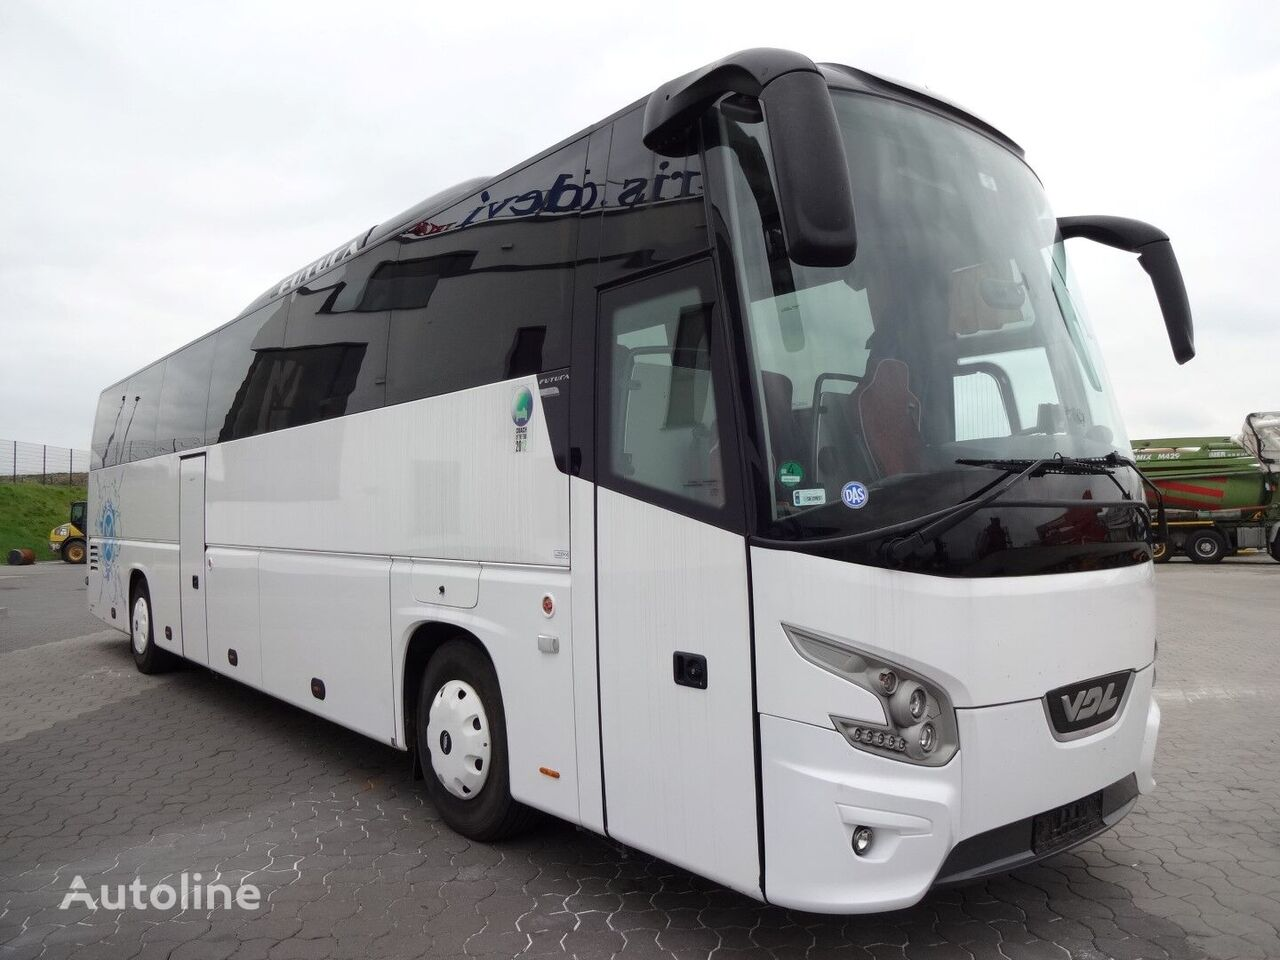 VDL VDL FUTURA 129/365 coach bus